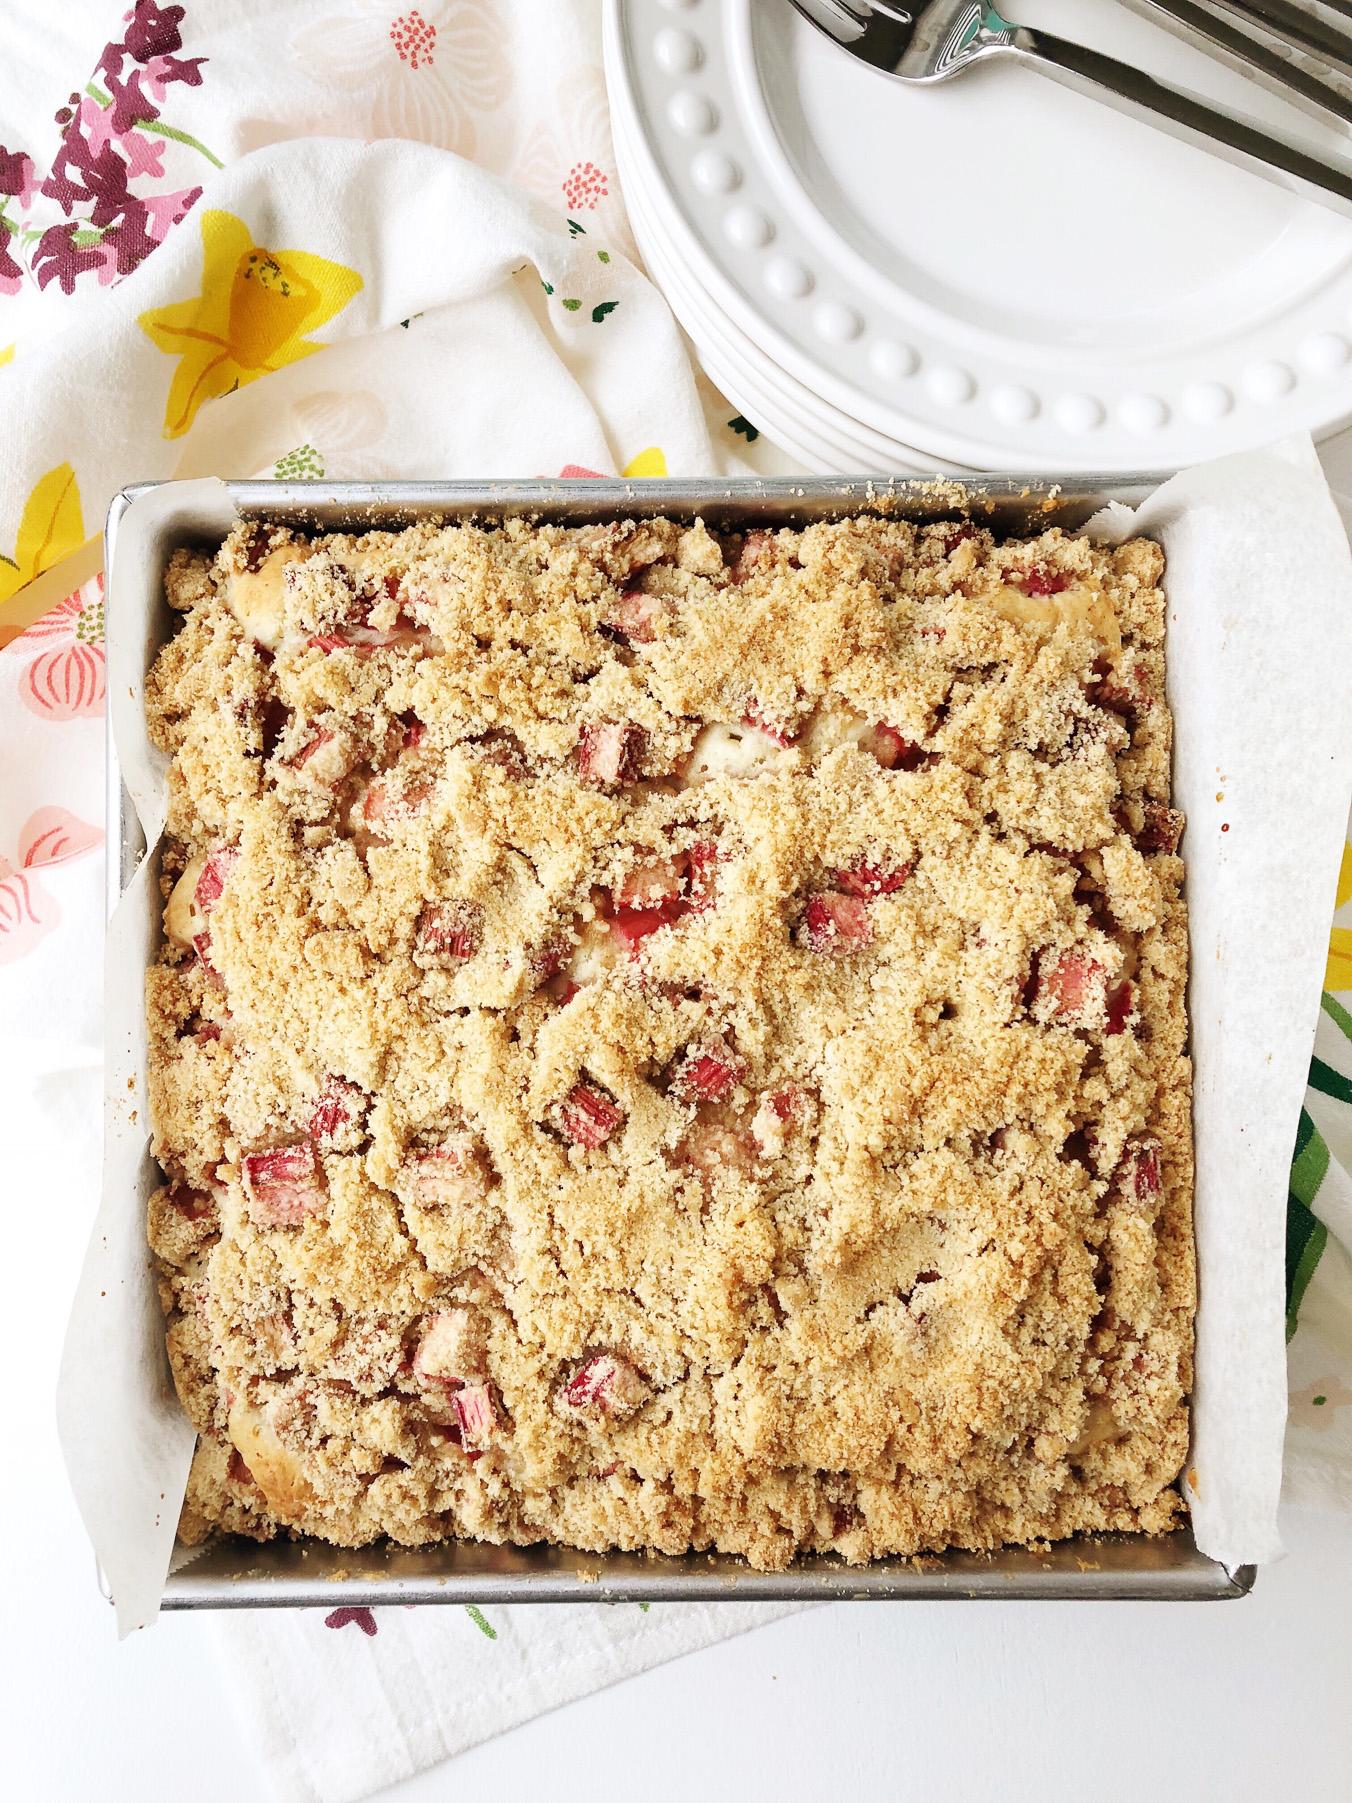 Rhubarb Sour Cream Snack Cake